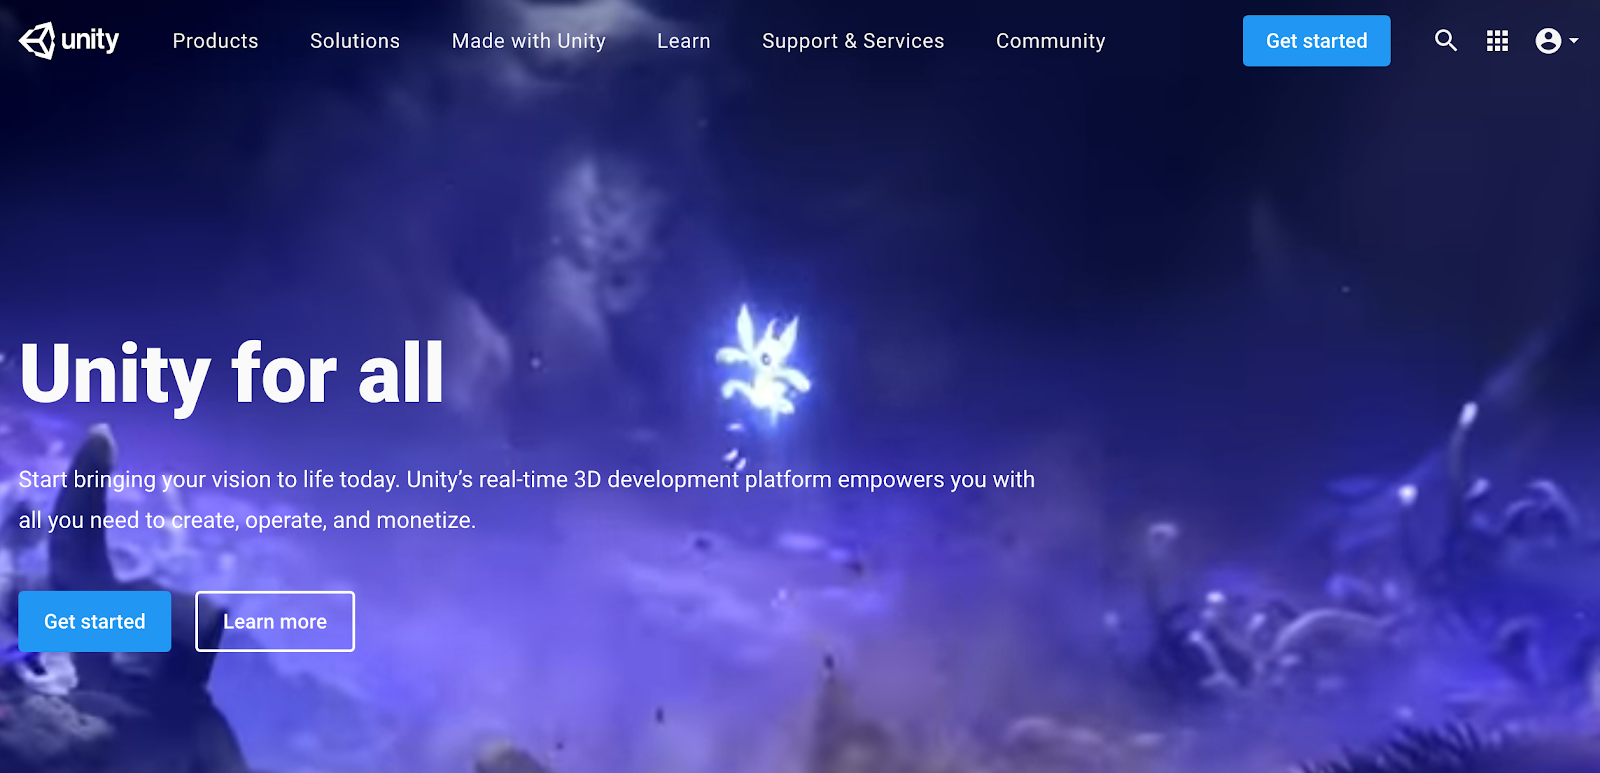 Unity - 3D Development Platform